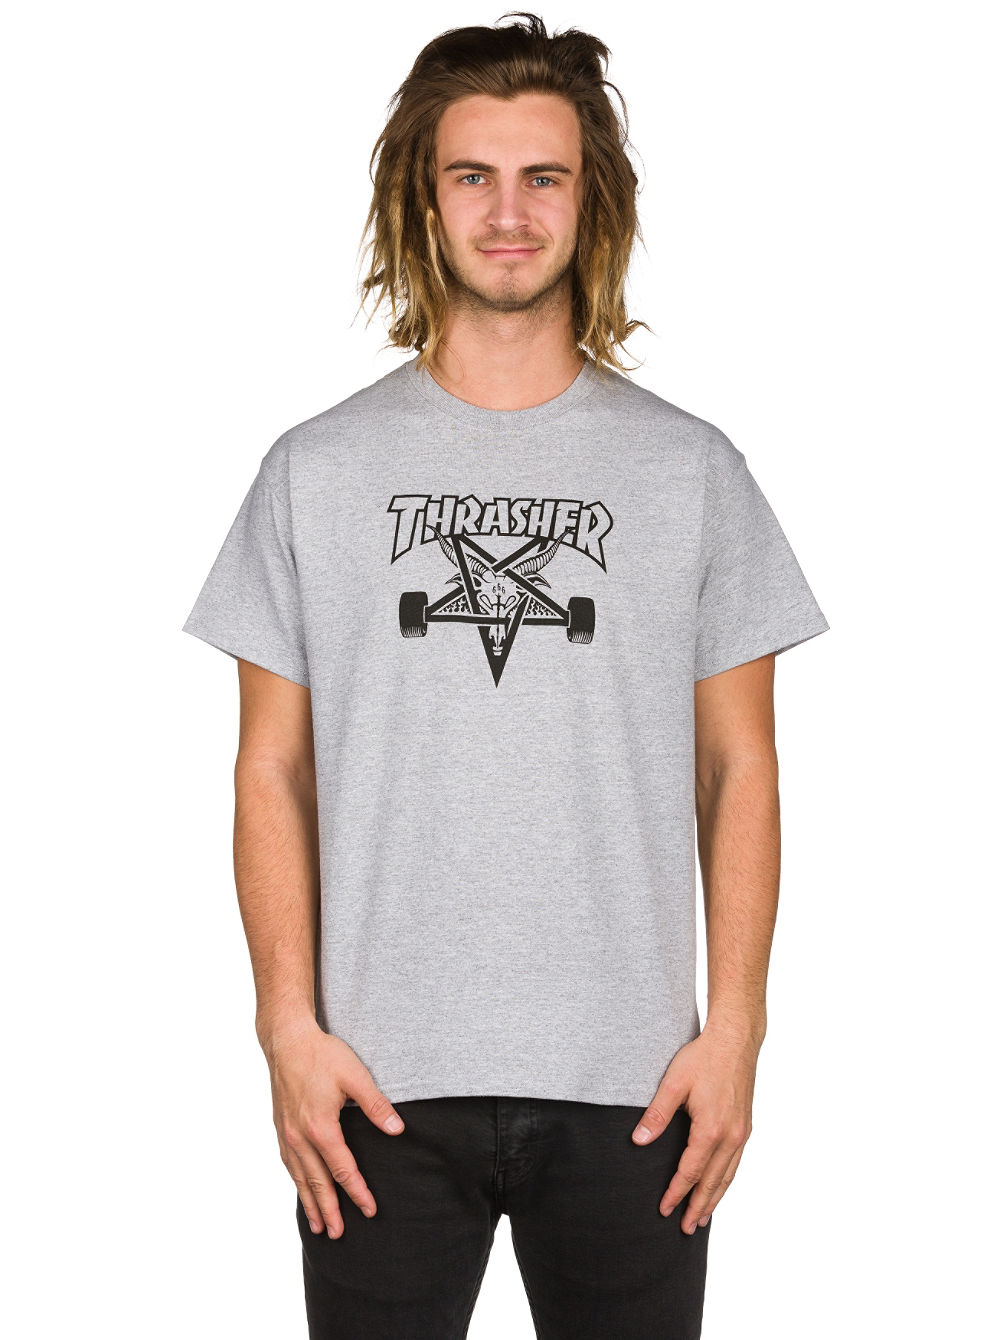 achetez thrasher skate goat t shirt en ligne sur blue. Black Bedroom Furniture Sets. Home Design Ideas